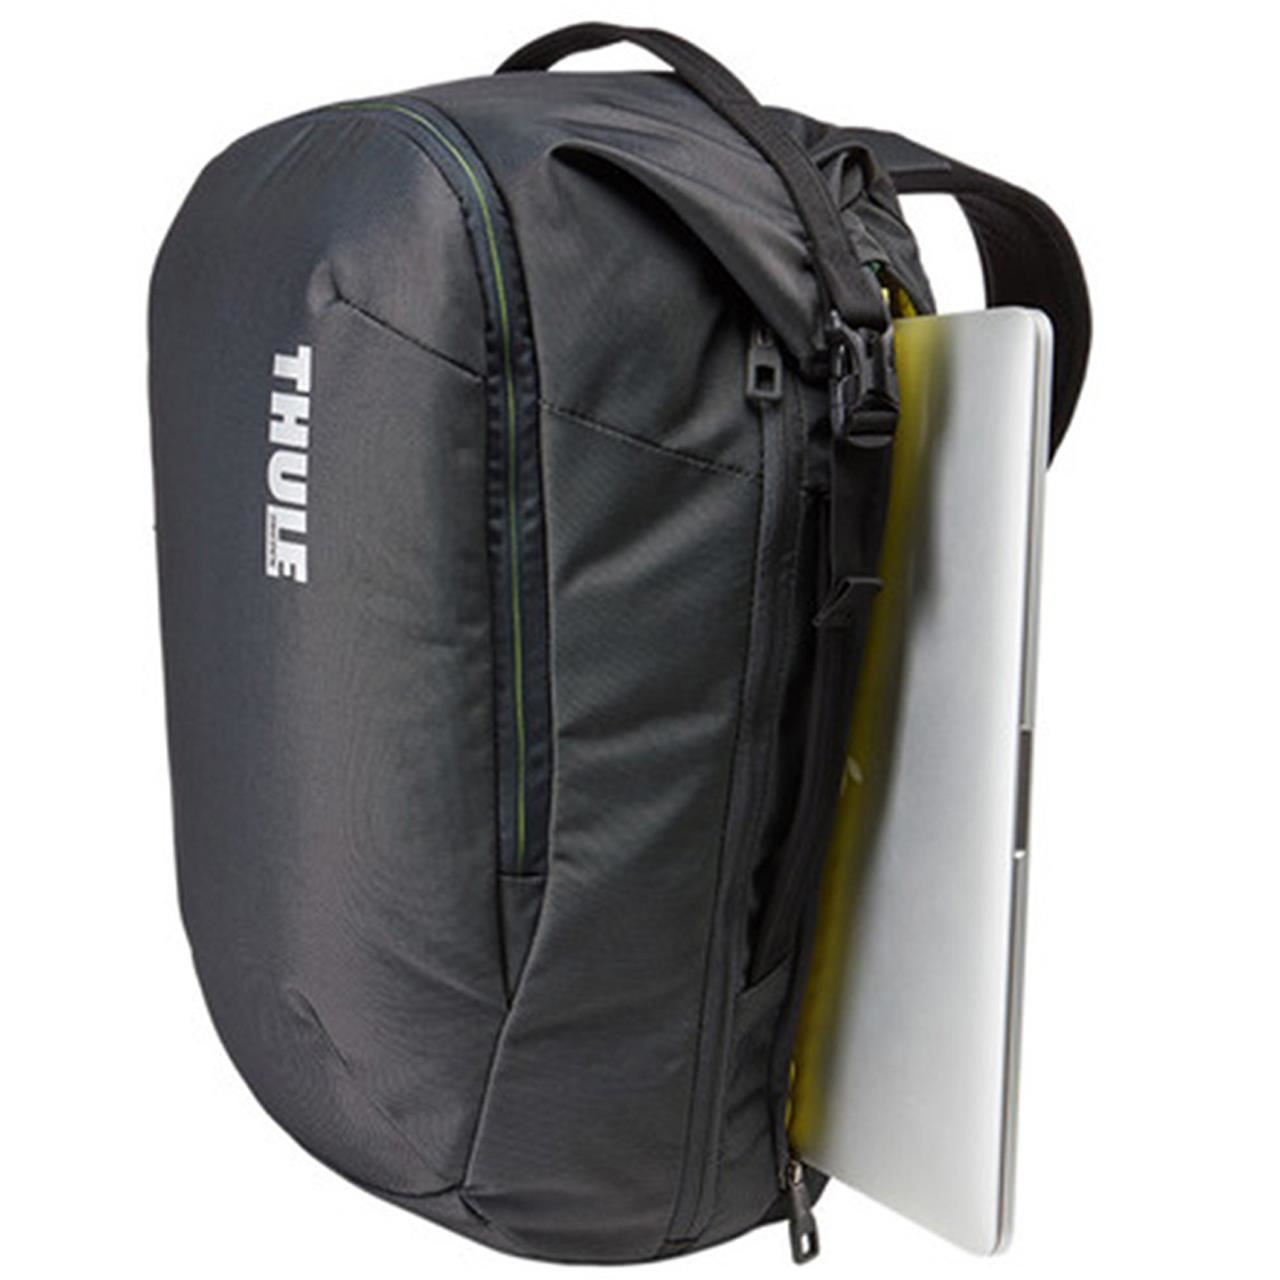 Rucsac urban cu compartiment laptop Thule Subterra Travel Backpack 34L Dark Shadow 5